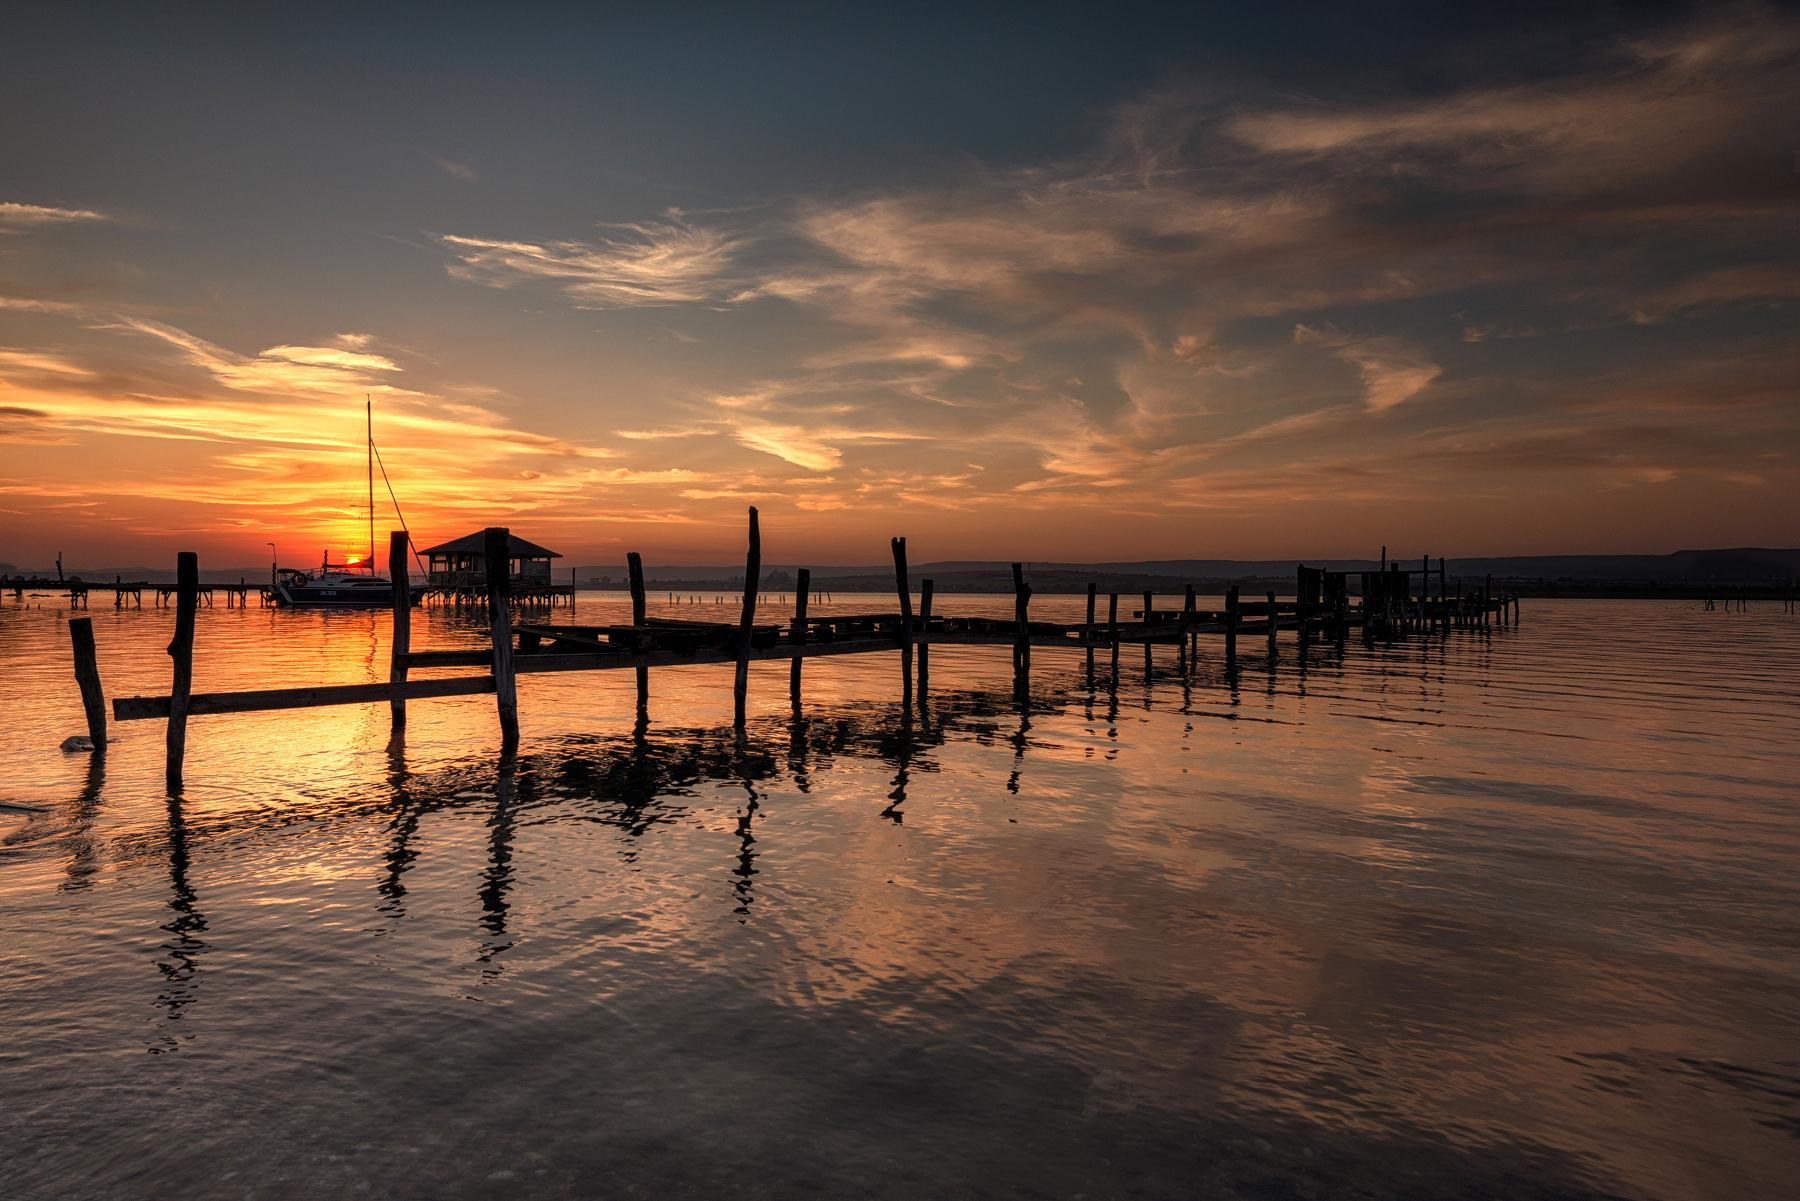 Sunset at Varna's lake, Bulgaria